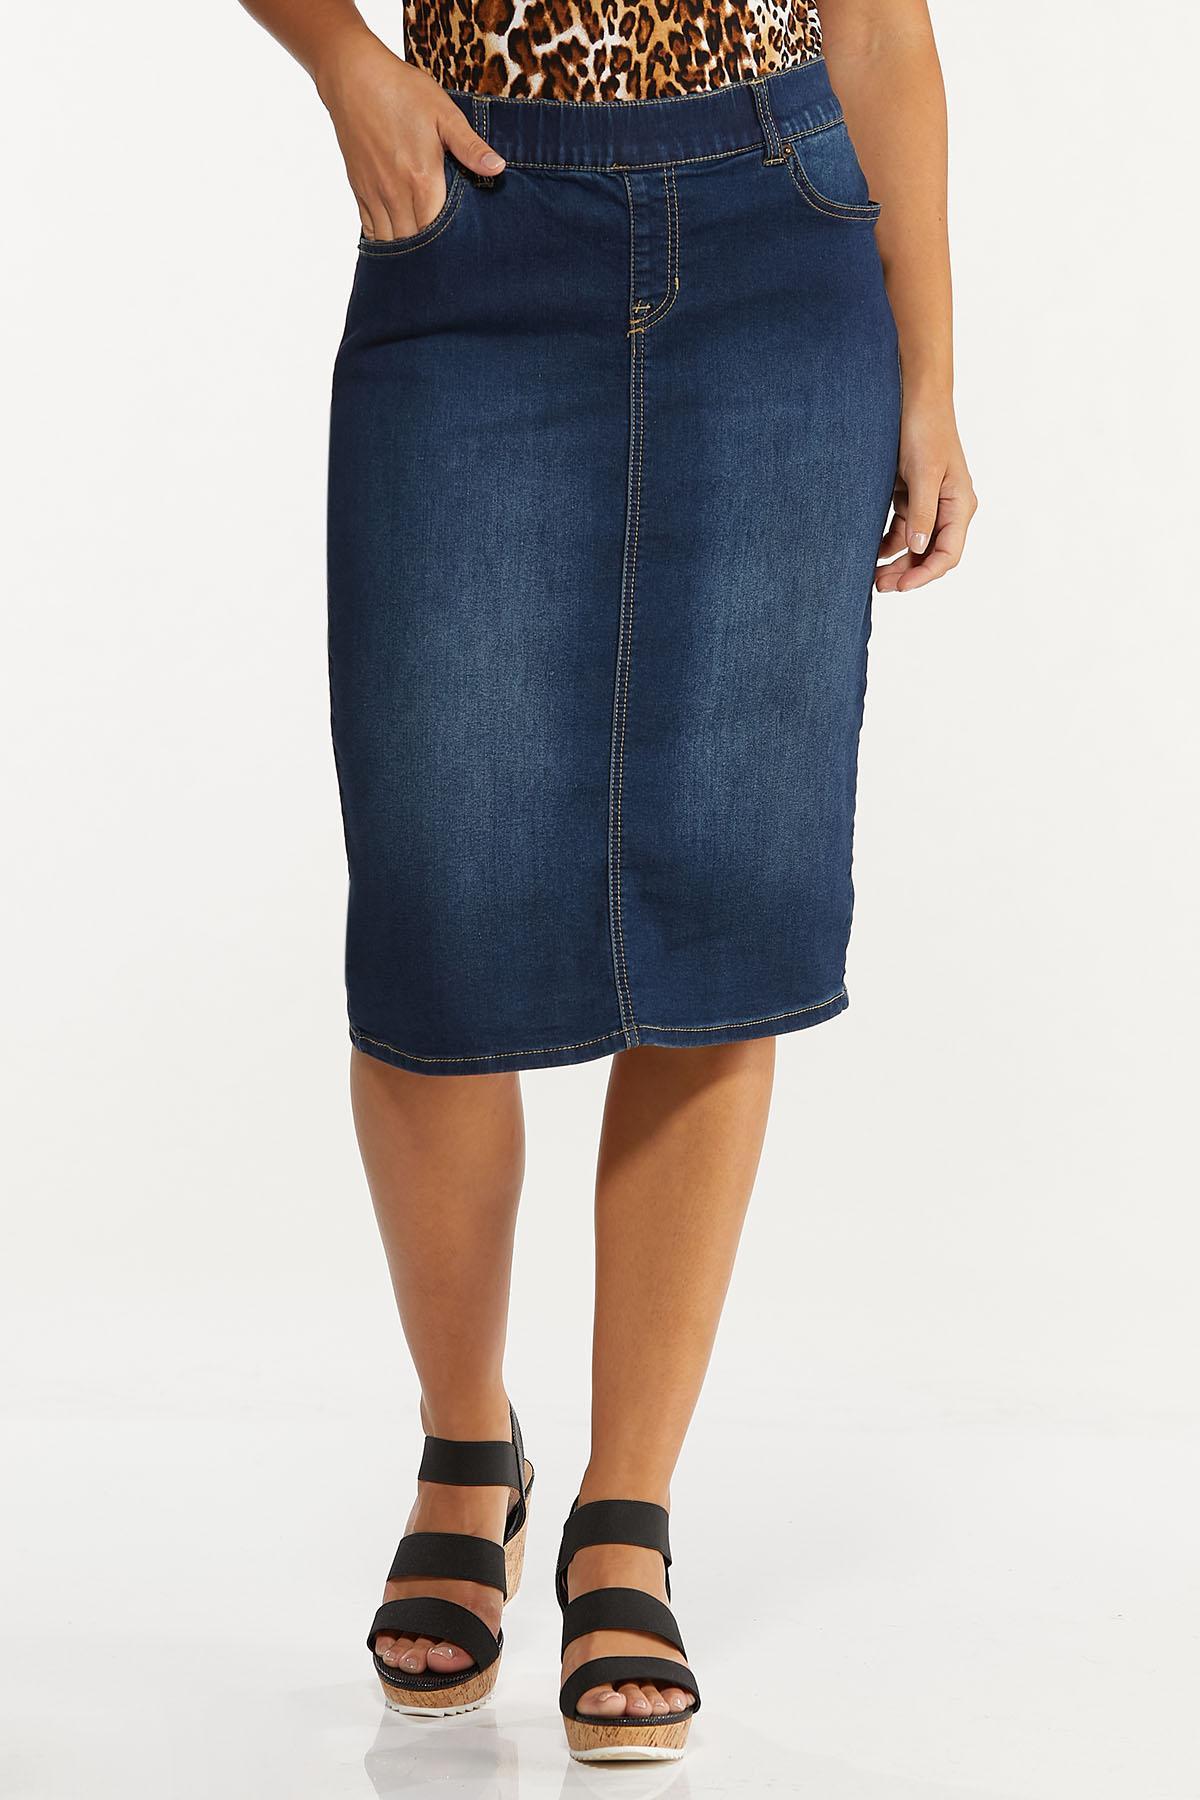 Plus Size Dark Denim Pull-On Skirt (Item #44636608)